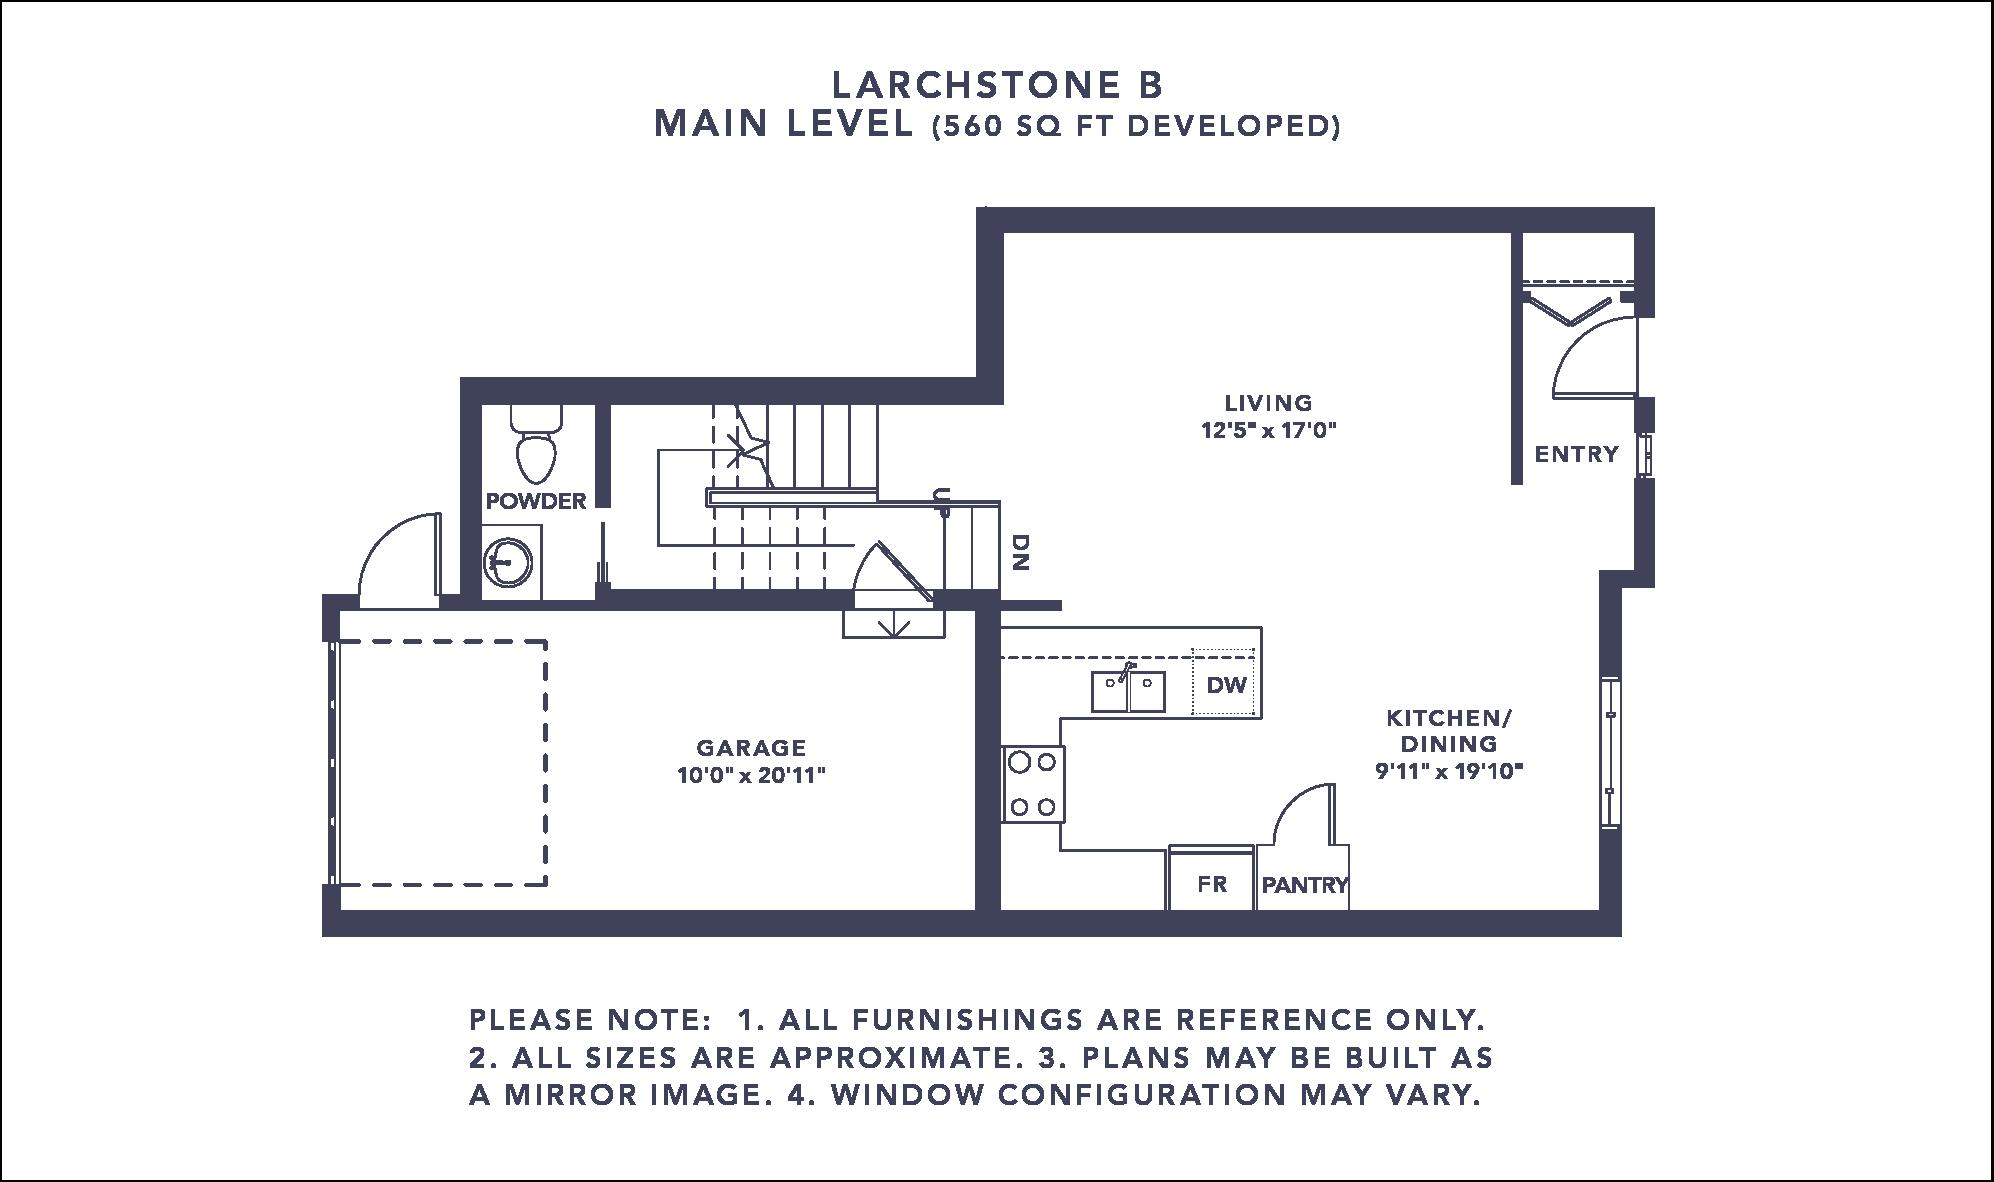 Larchstone B Floorplan - Main Level